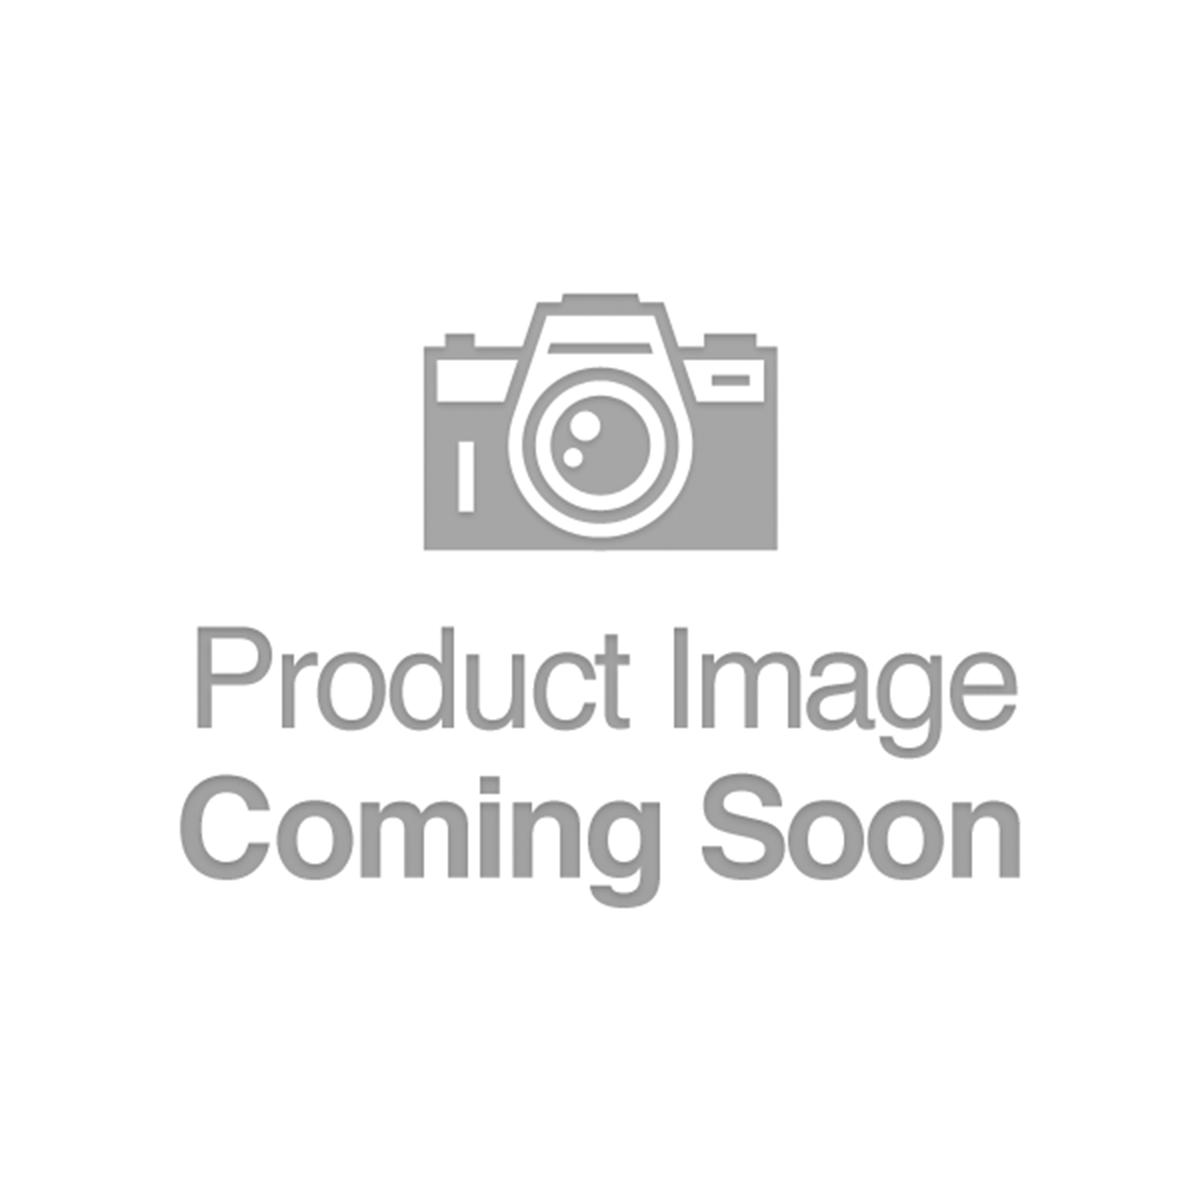 Alexandria - Virginia - CH 1716 - FR 1802-1 - VF